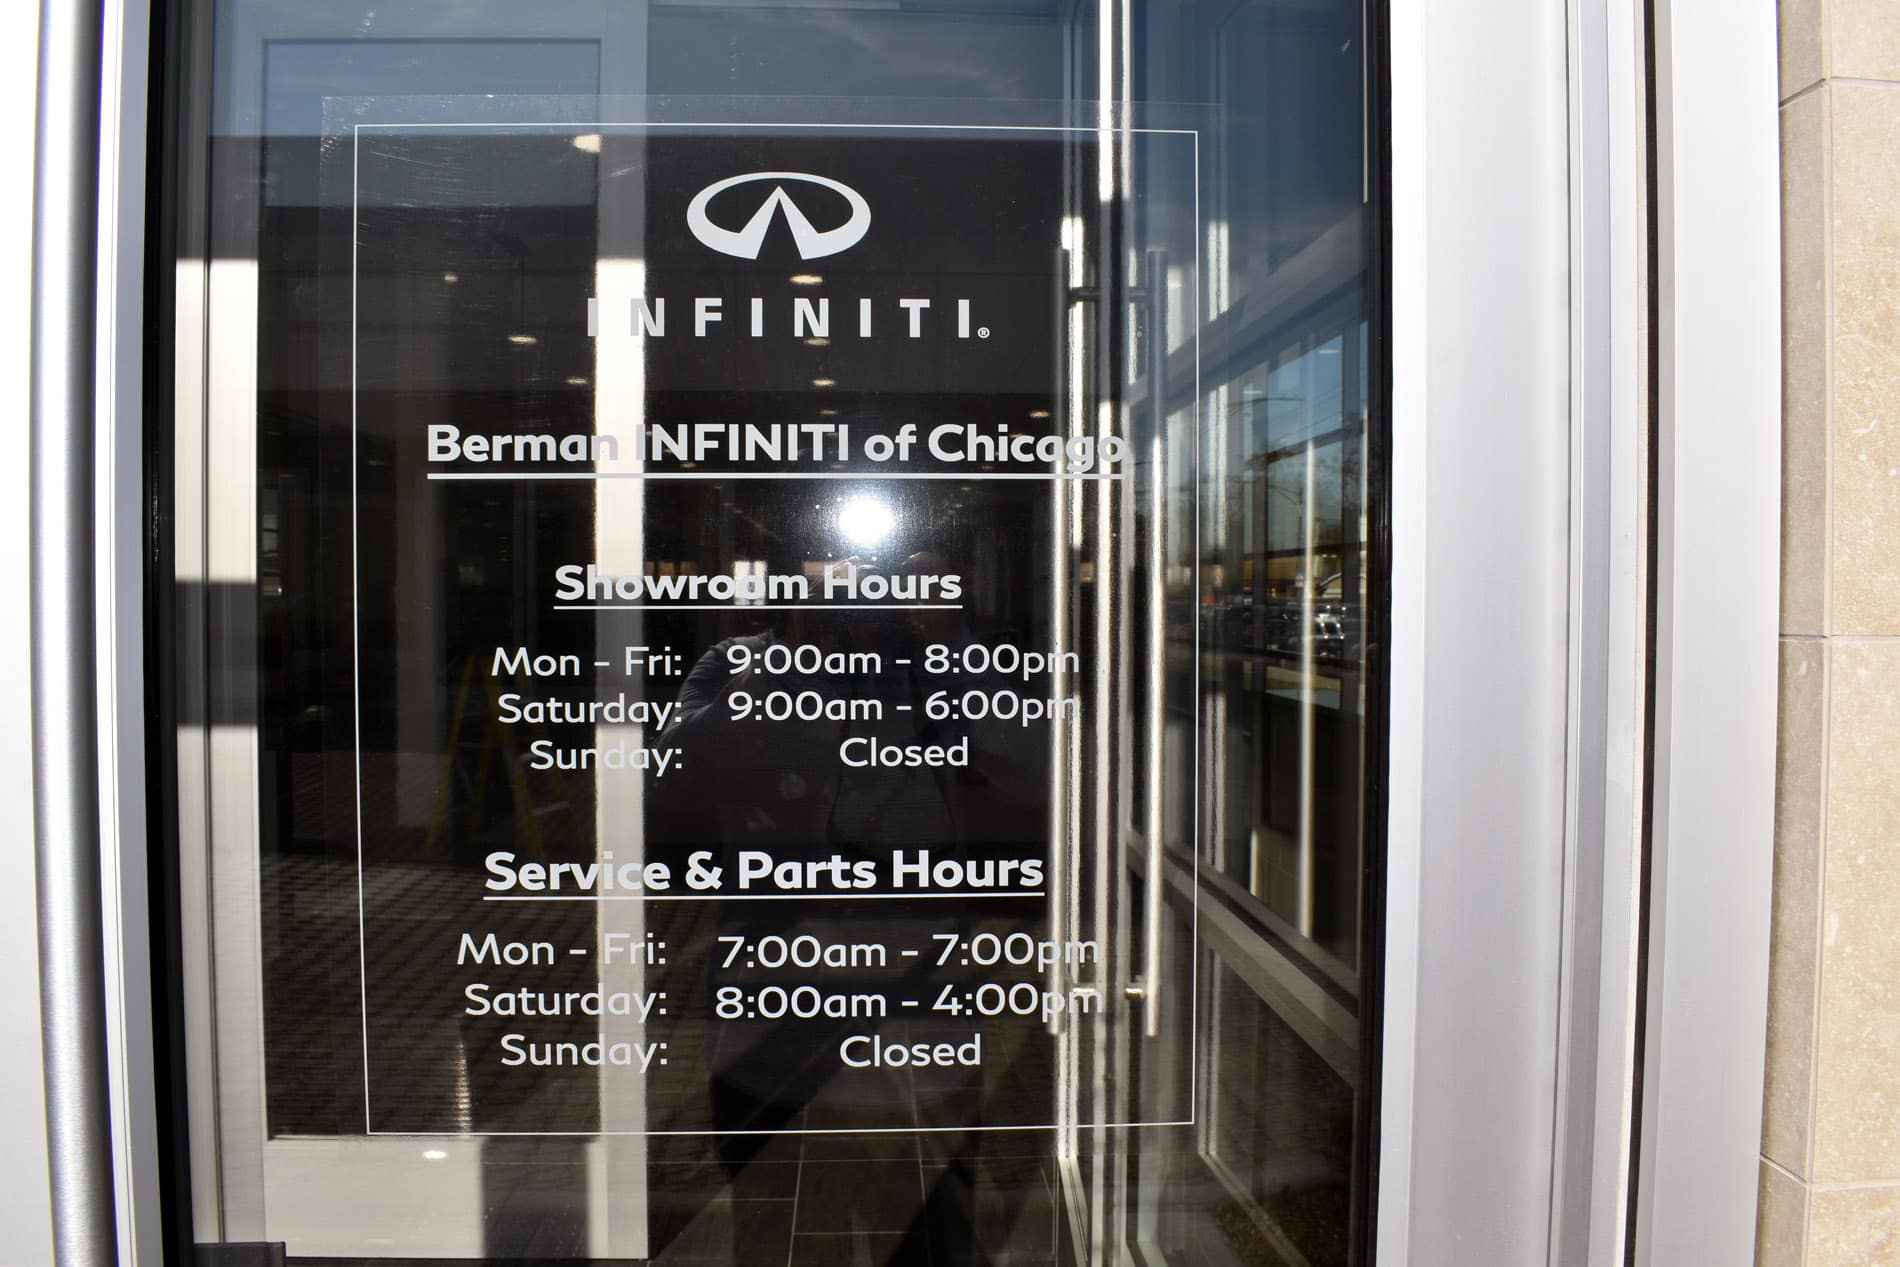 Berman INFINITI Chicago Exterior 03